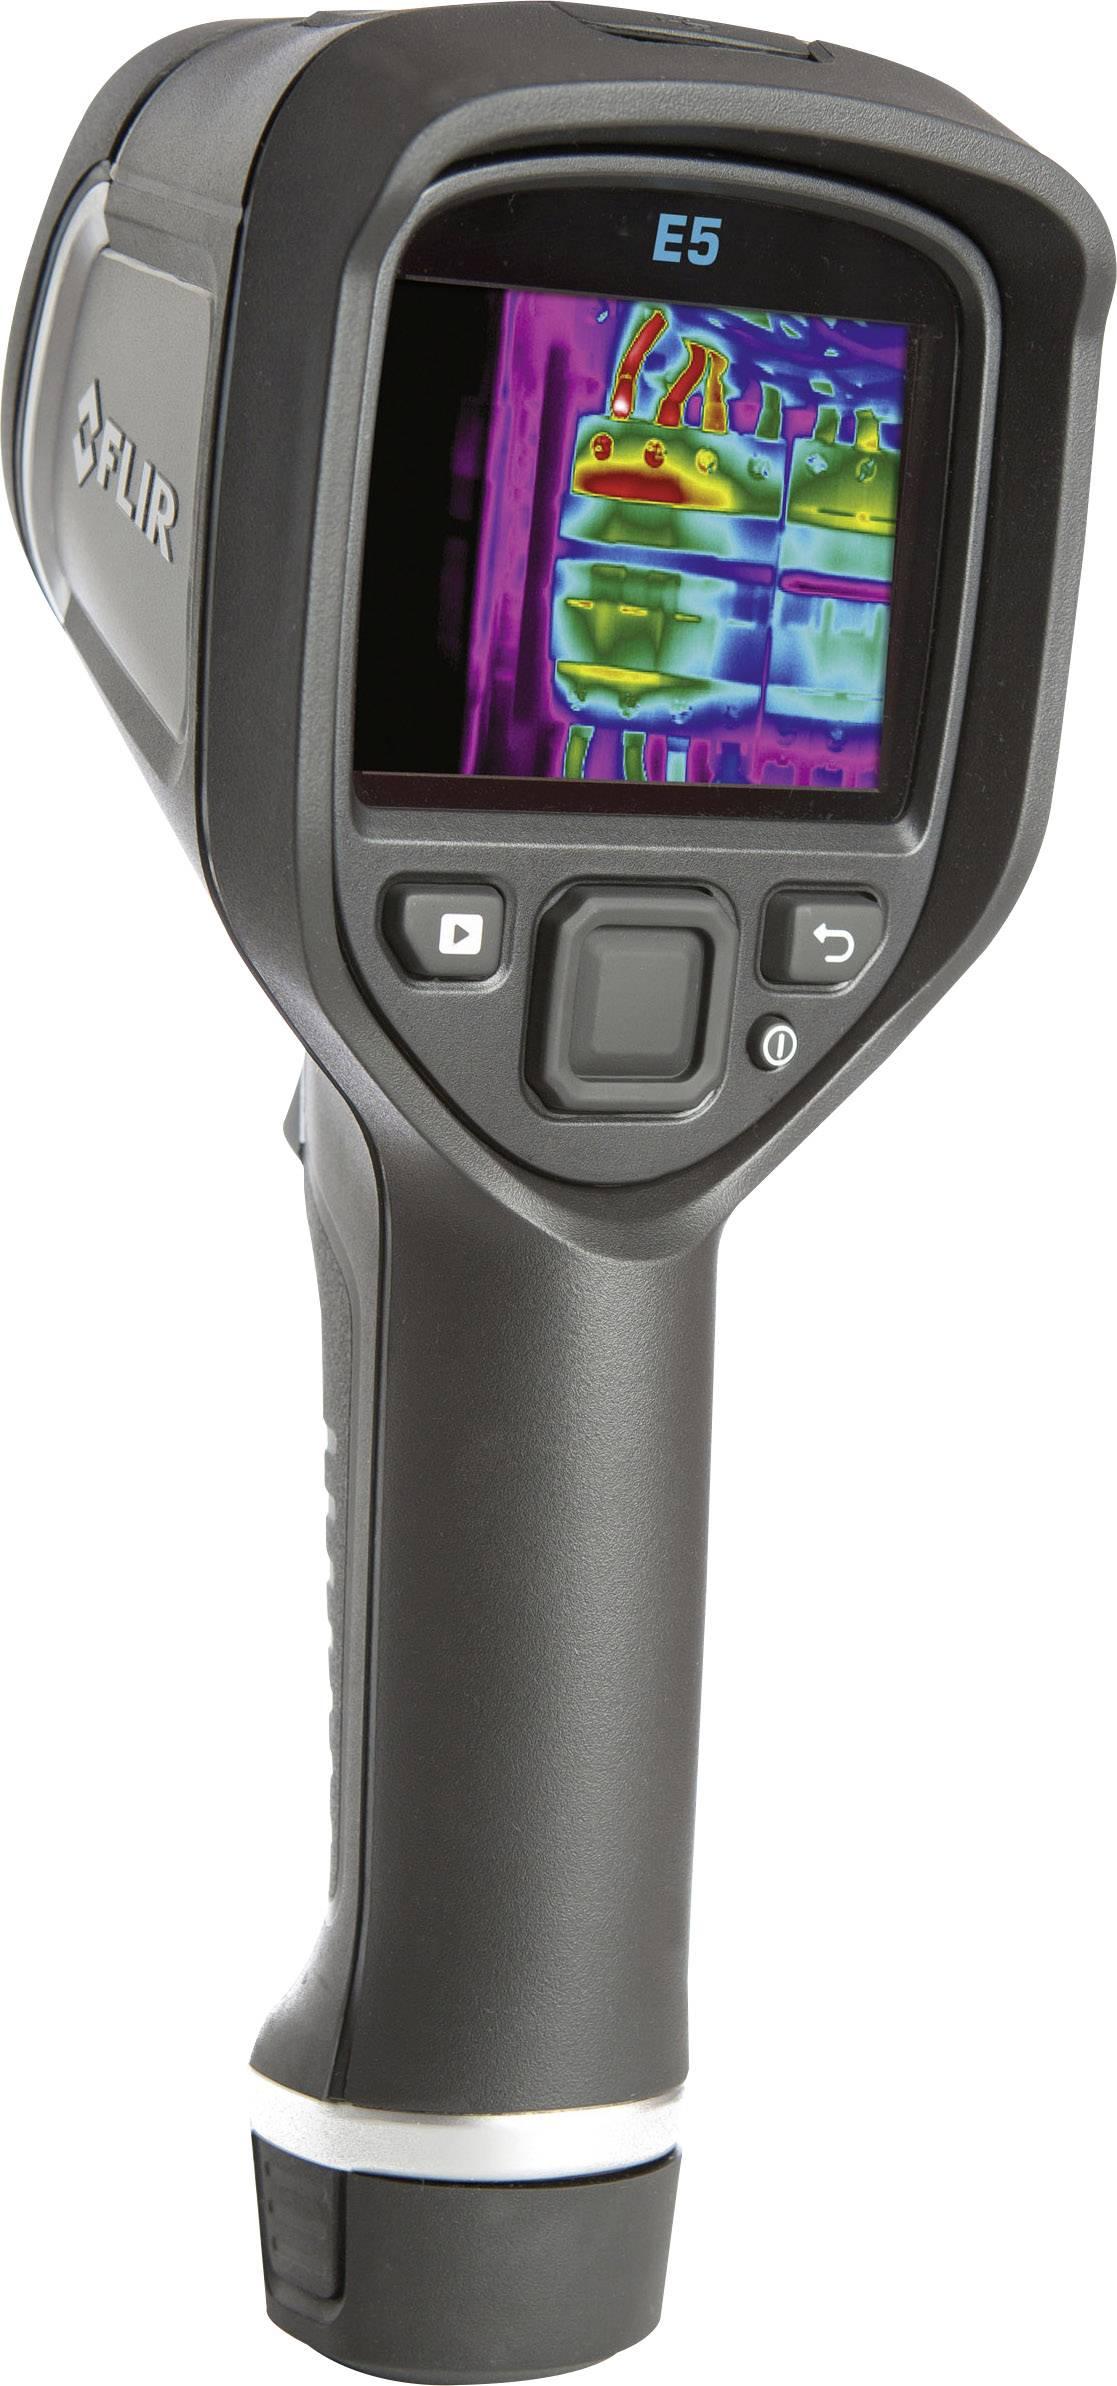 Termokamera FLIR E5 WiFi 63909-0904, 120 x 90 pix